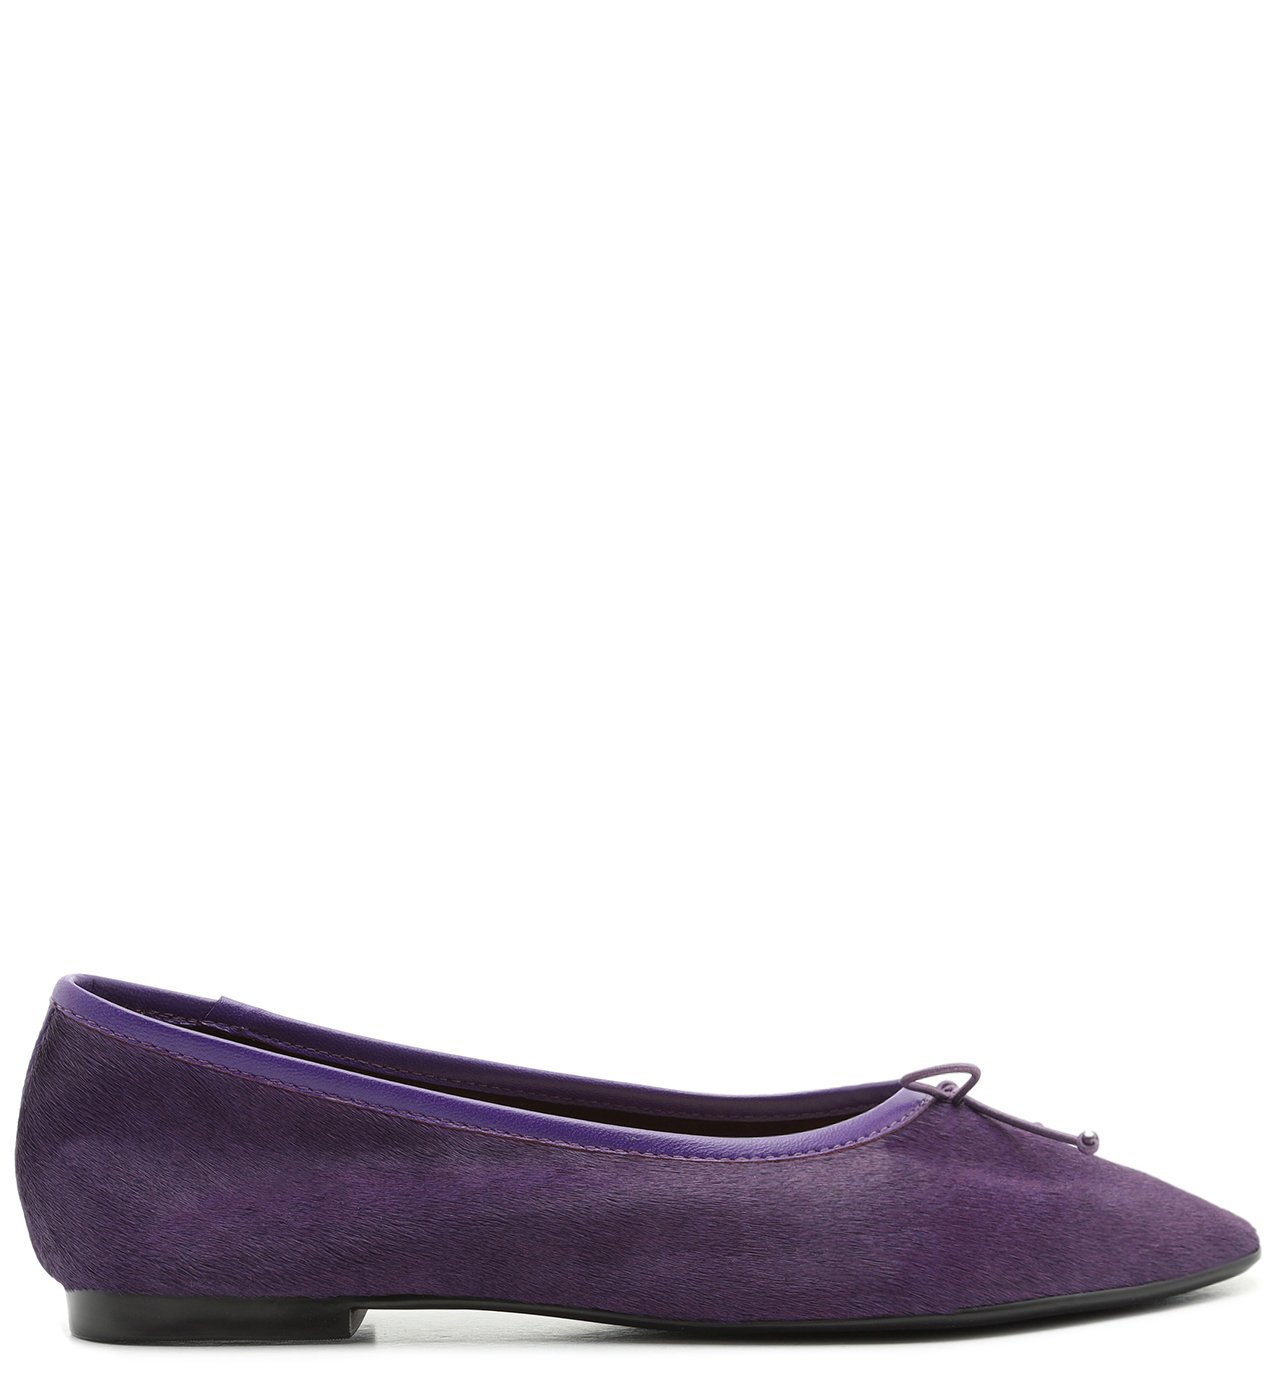 Sapatilha Ballerina Veludo Purple | Schutz